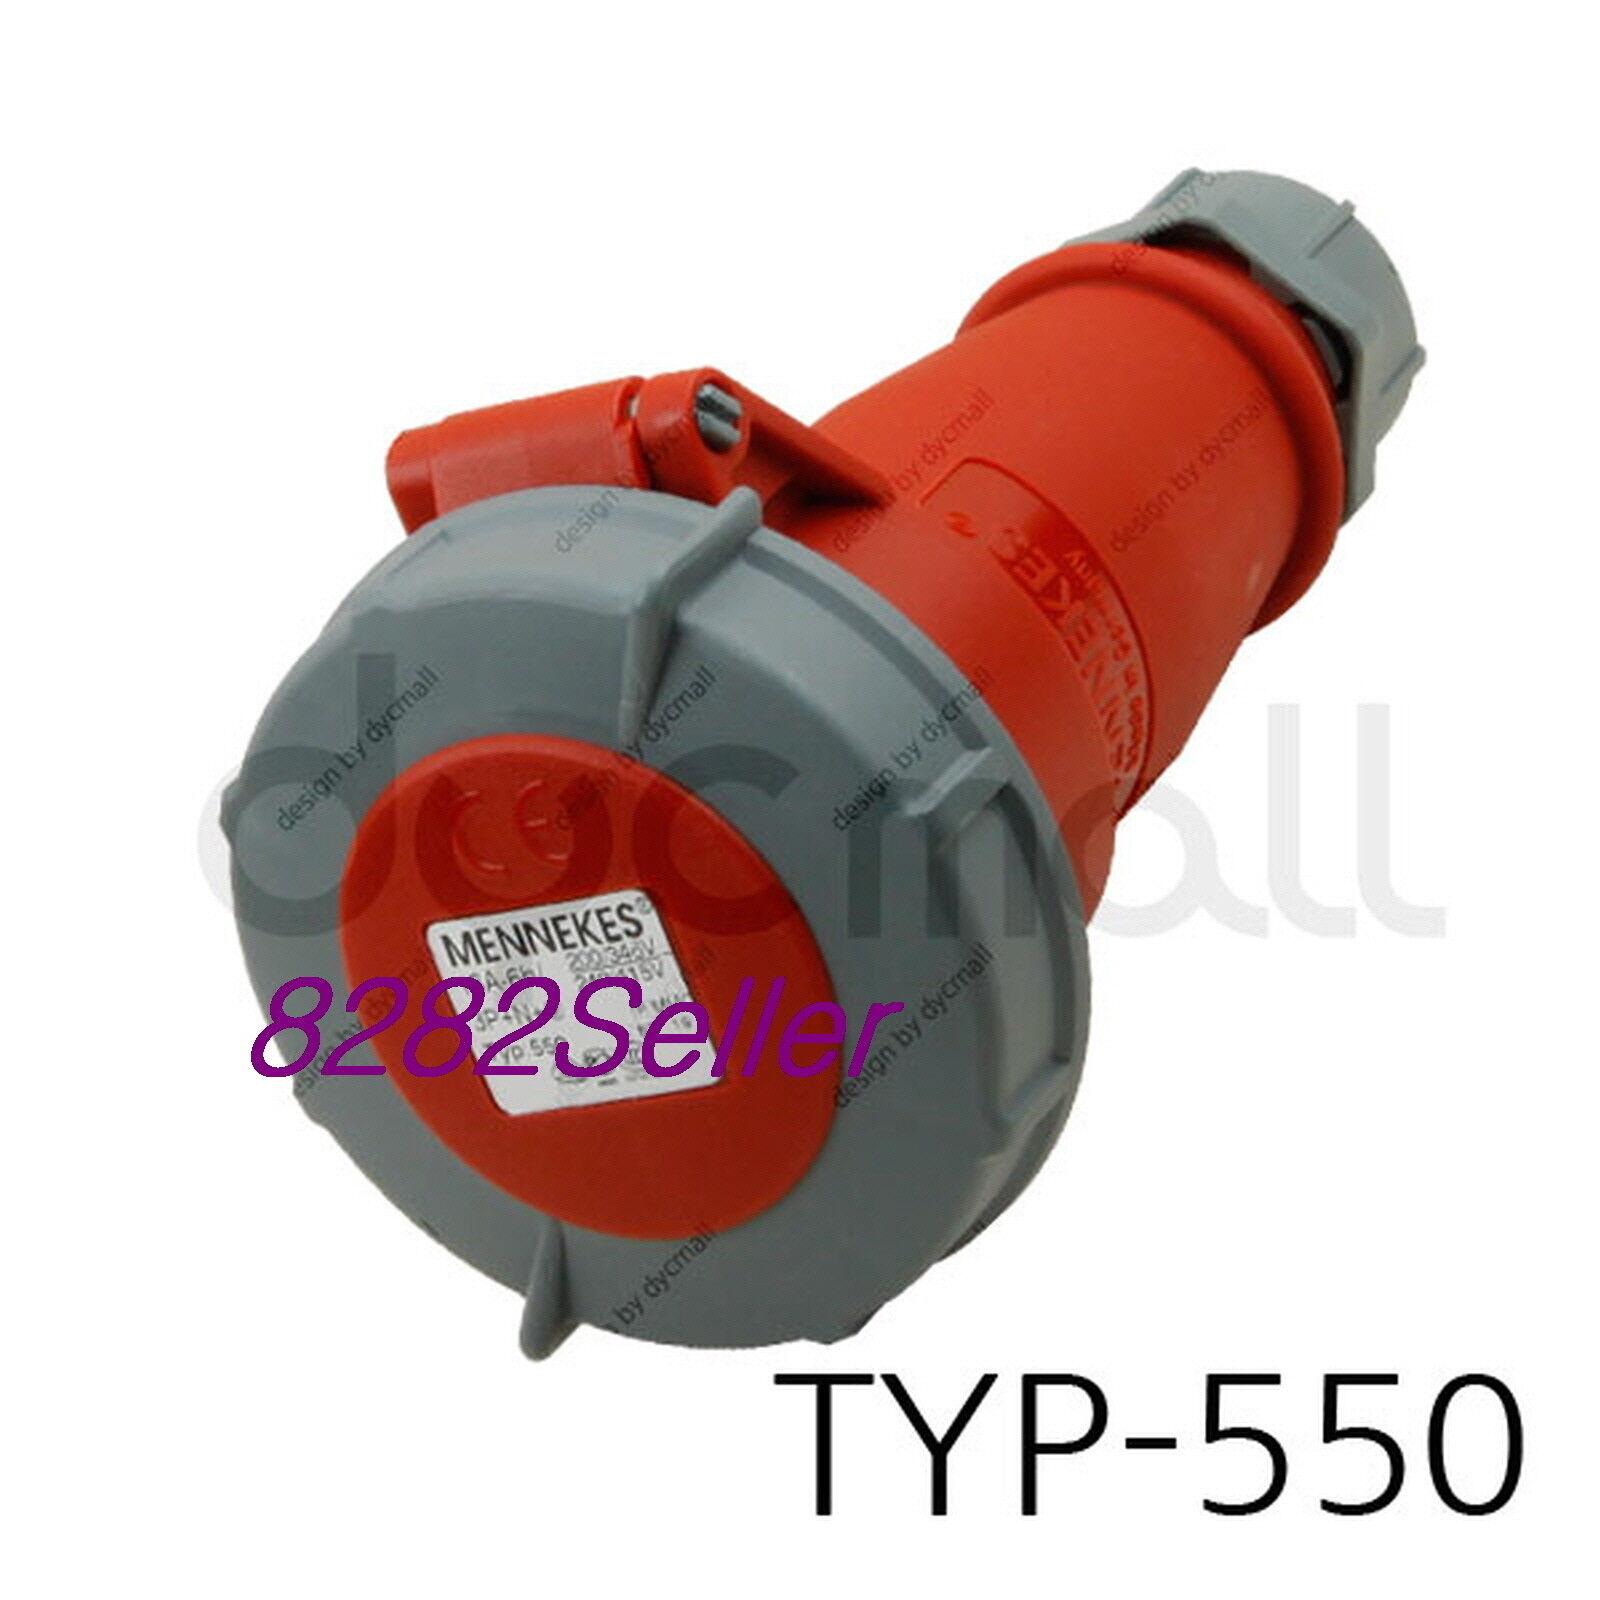 IP44 400V 32A 3P+N+E Screw terminals single part body MENNEKES TYP 4 Part no.4